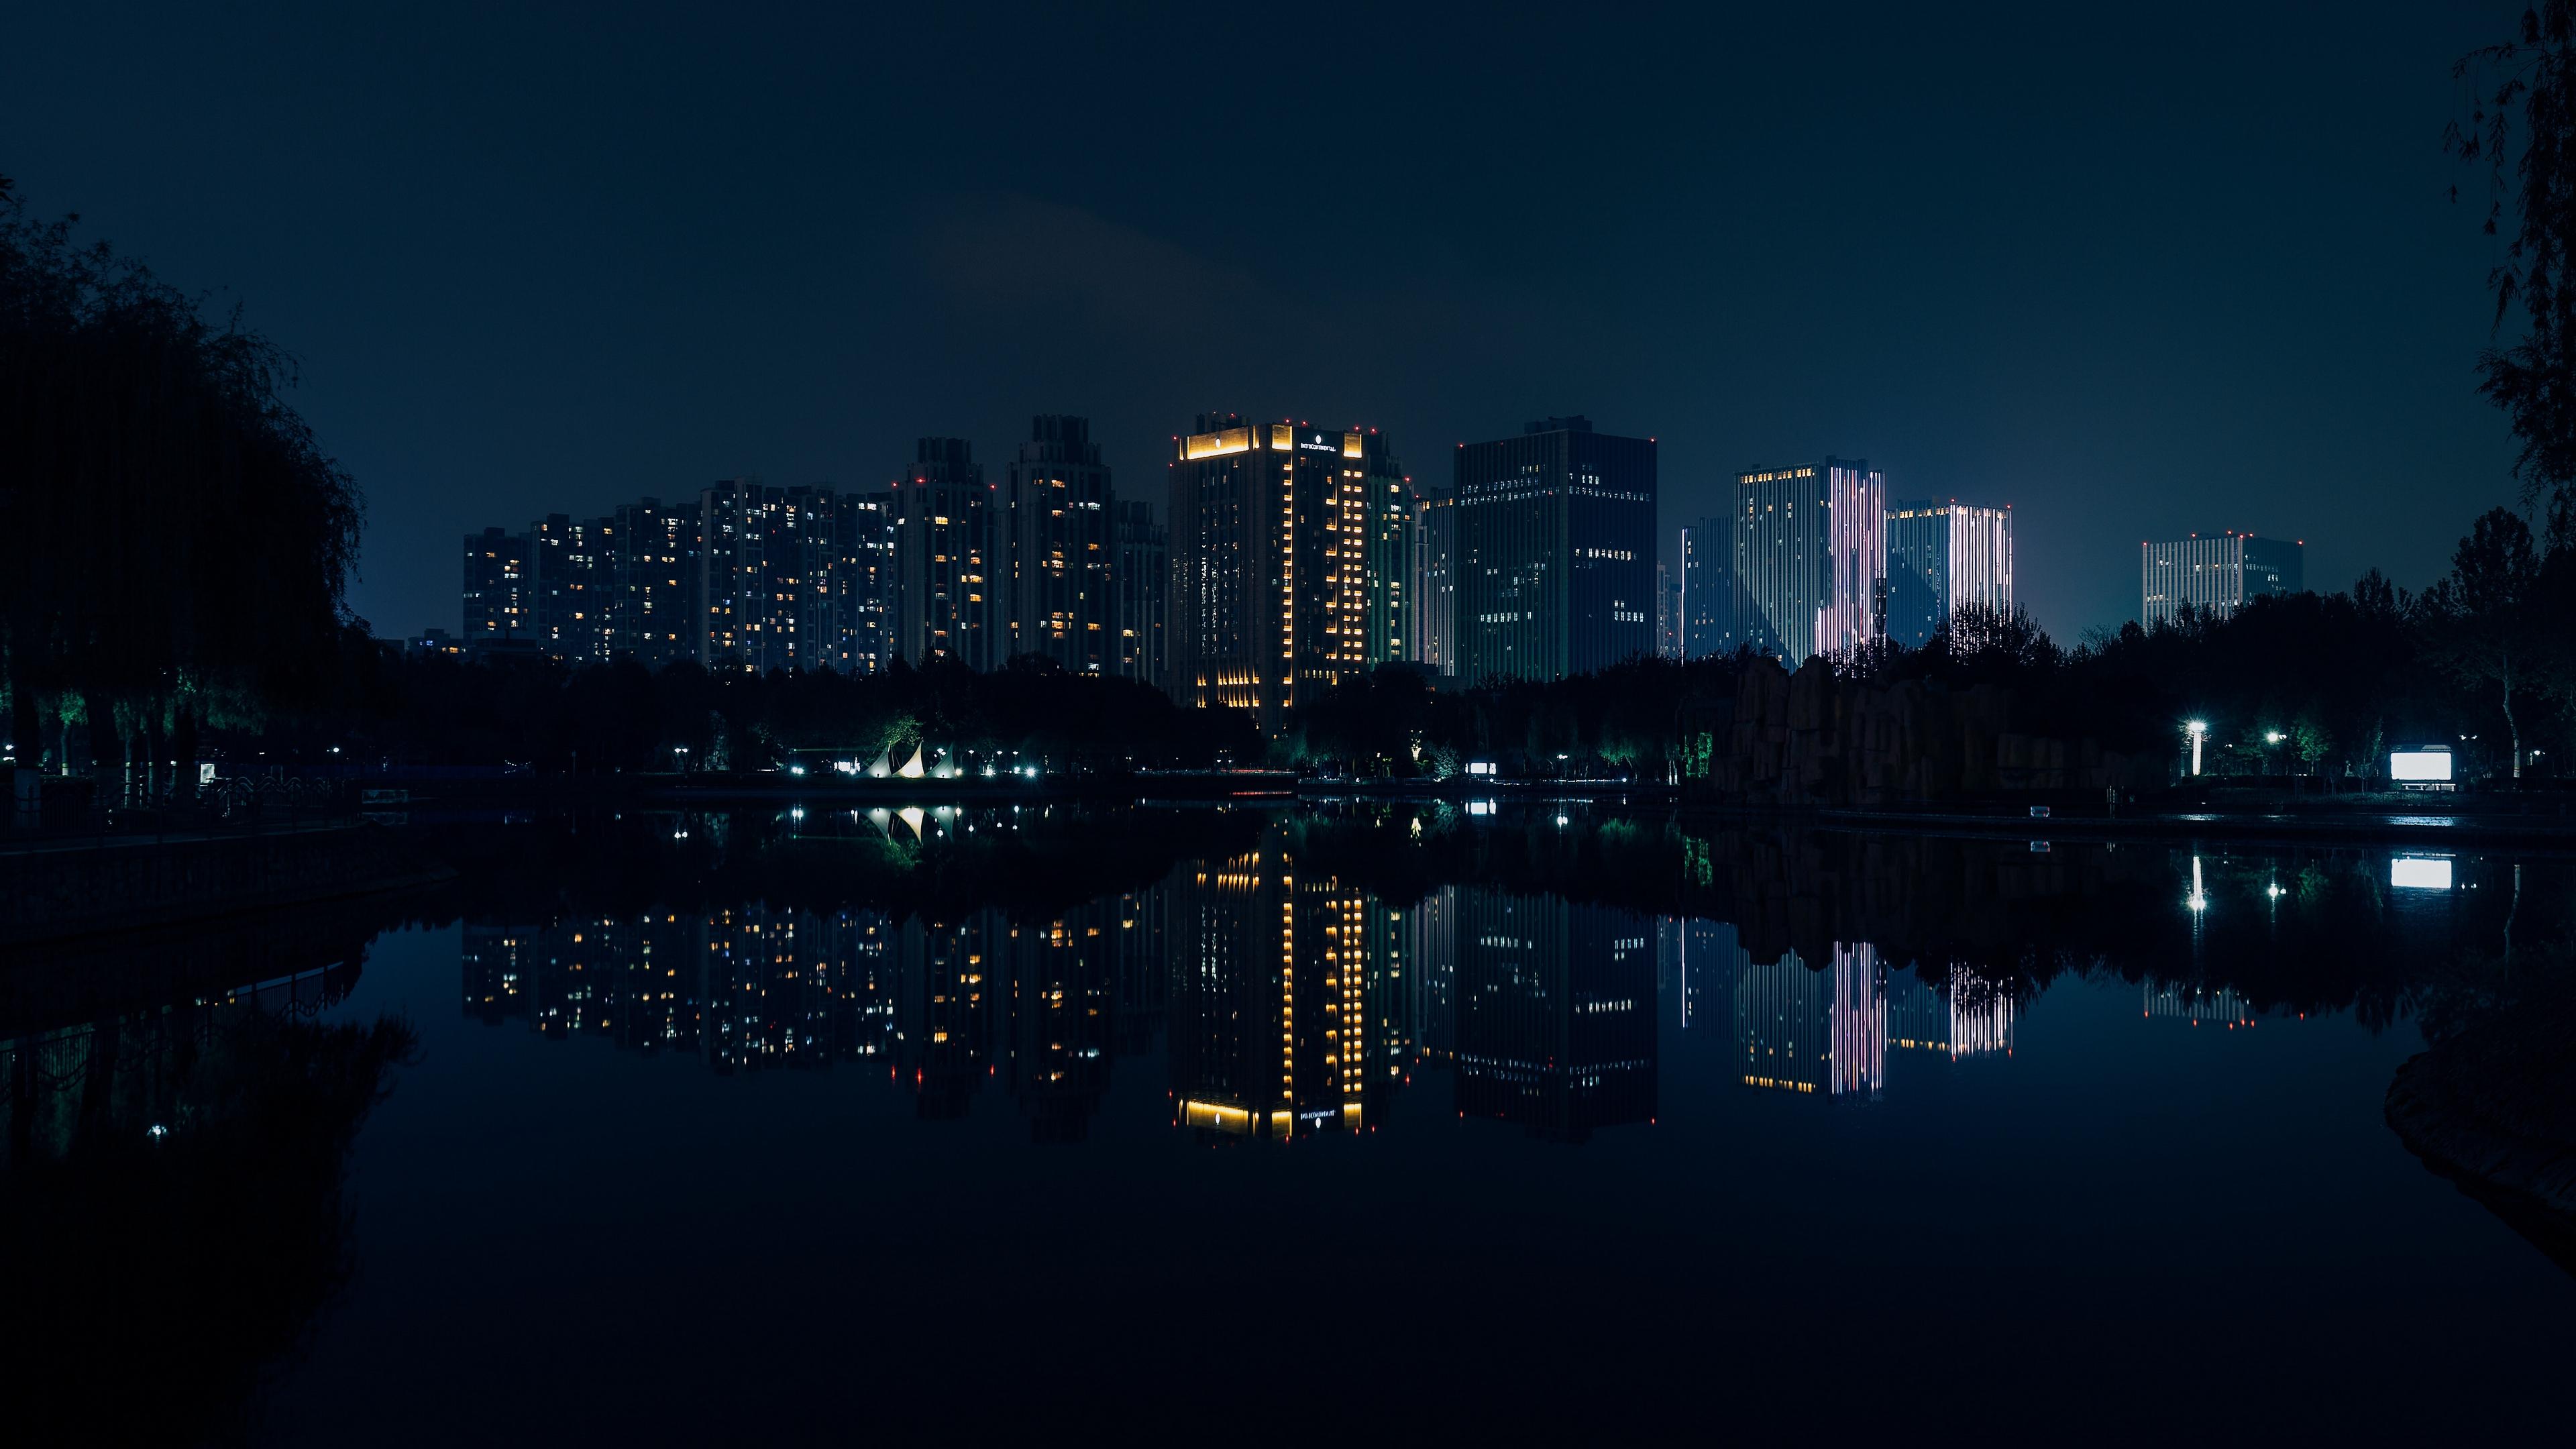 Wallpaper 4k Night City Panorama River Reflection